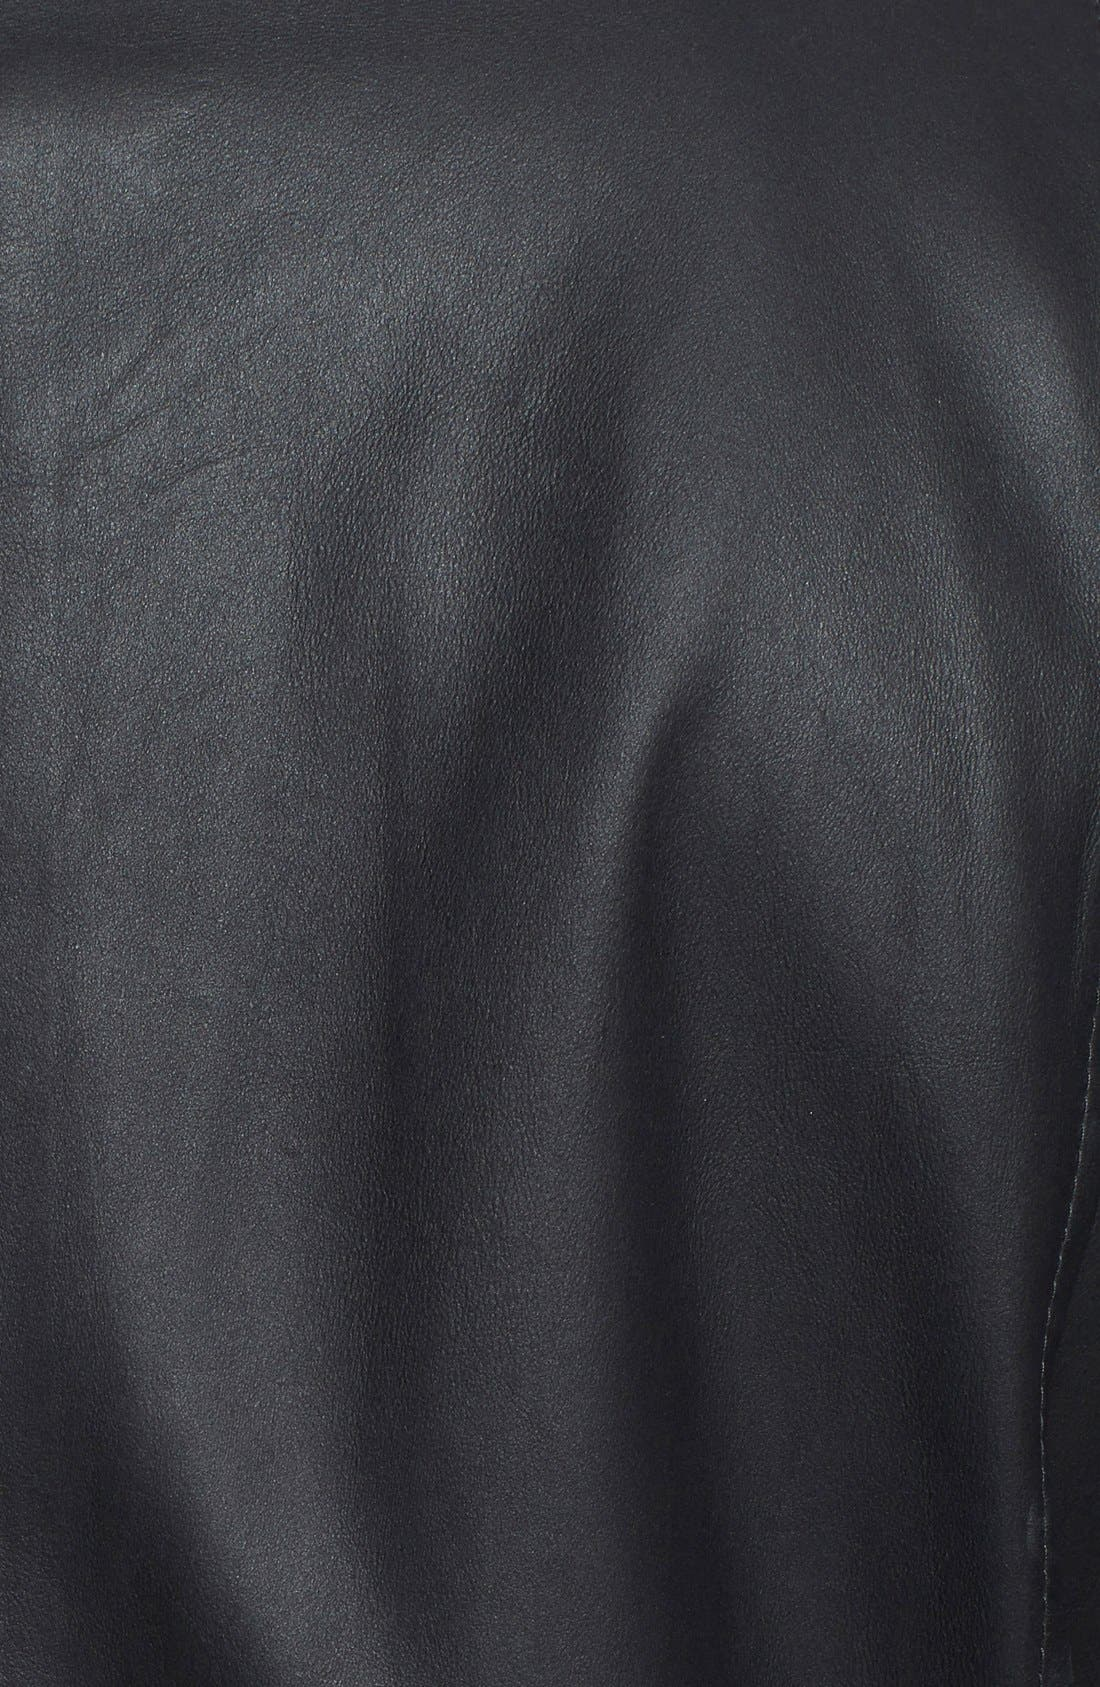 Alternate Image 3  - Remy Leather 'Lite' Lambskin Leather Jacket